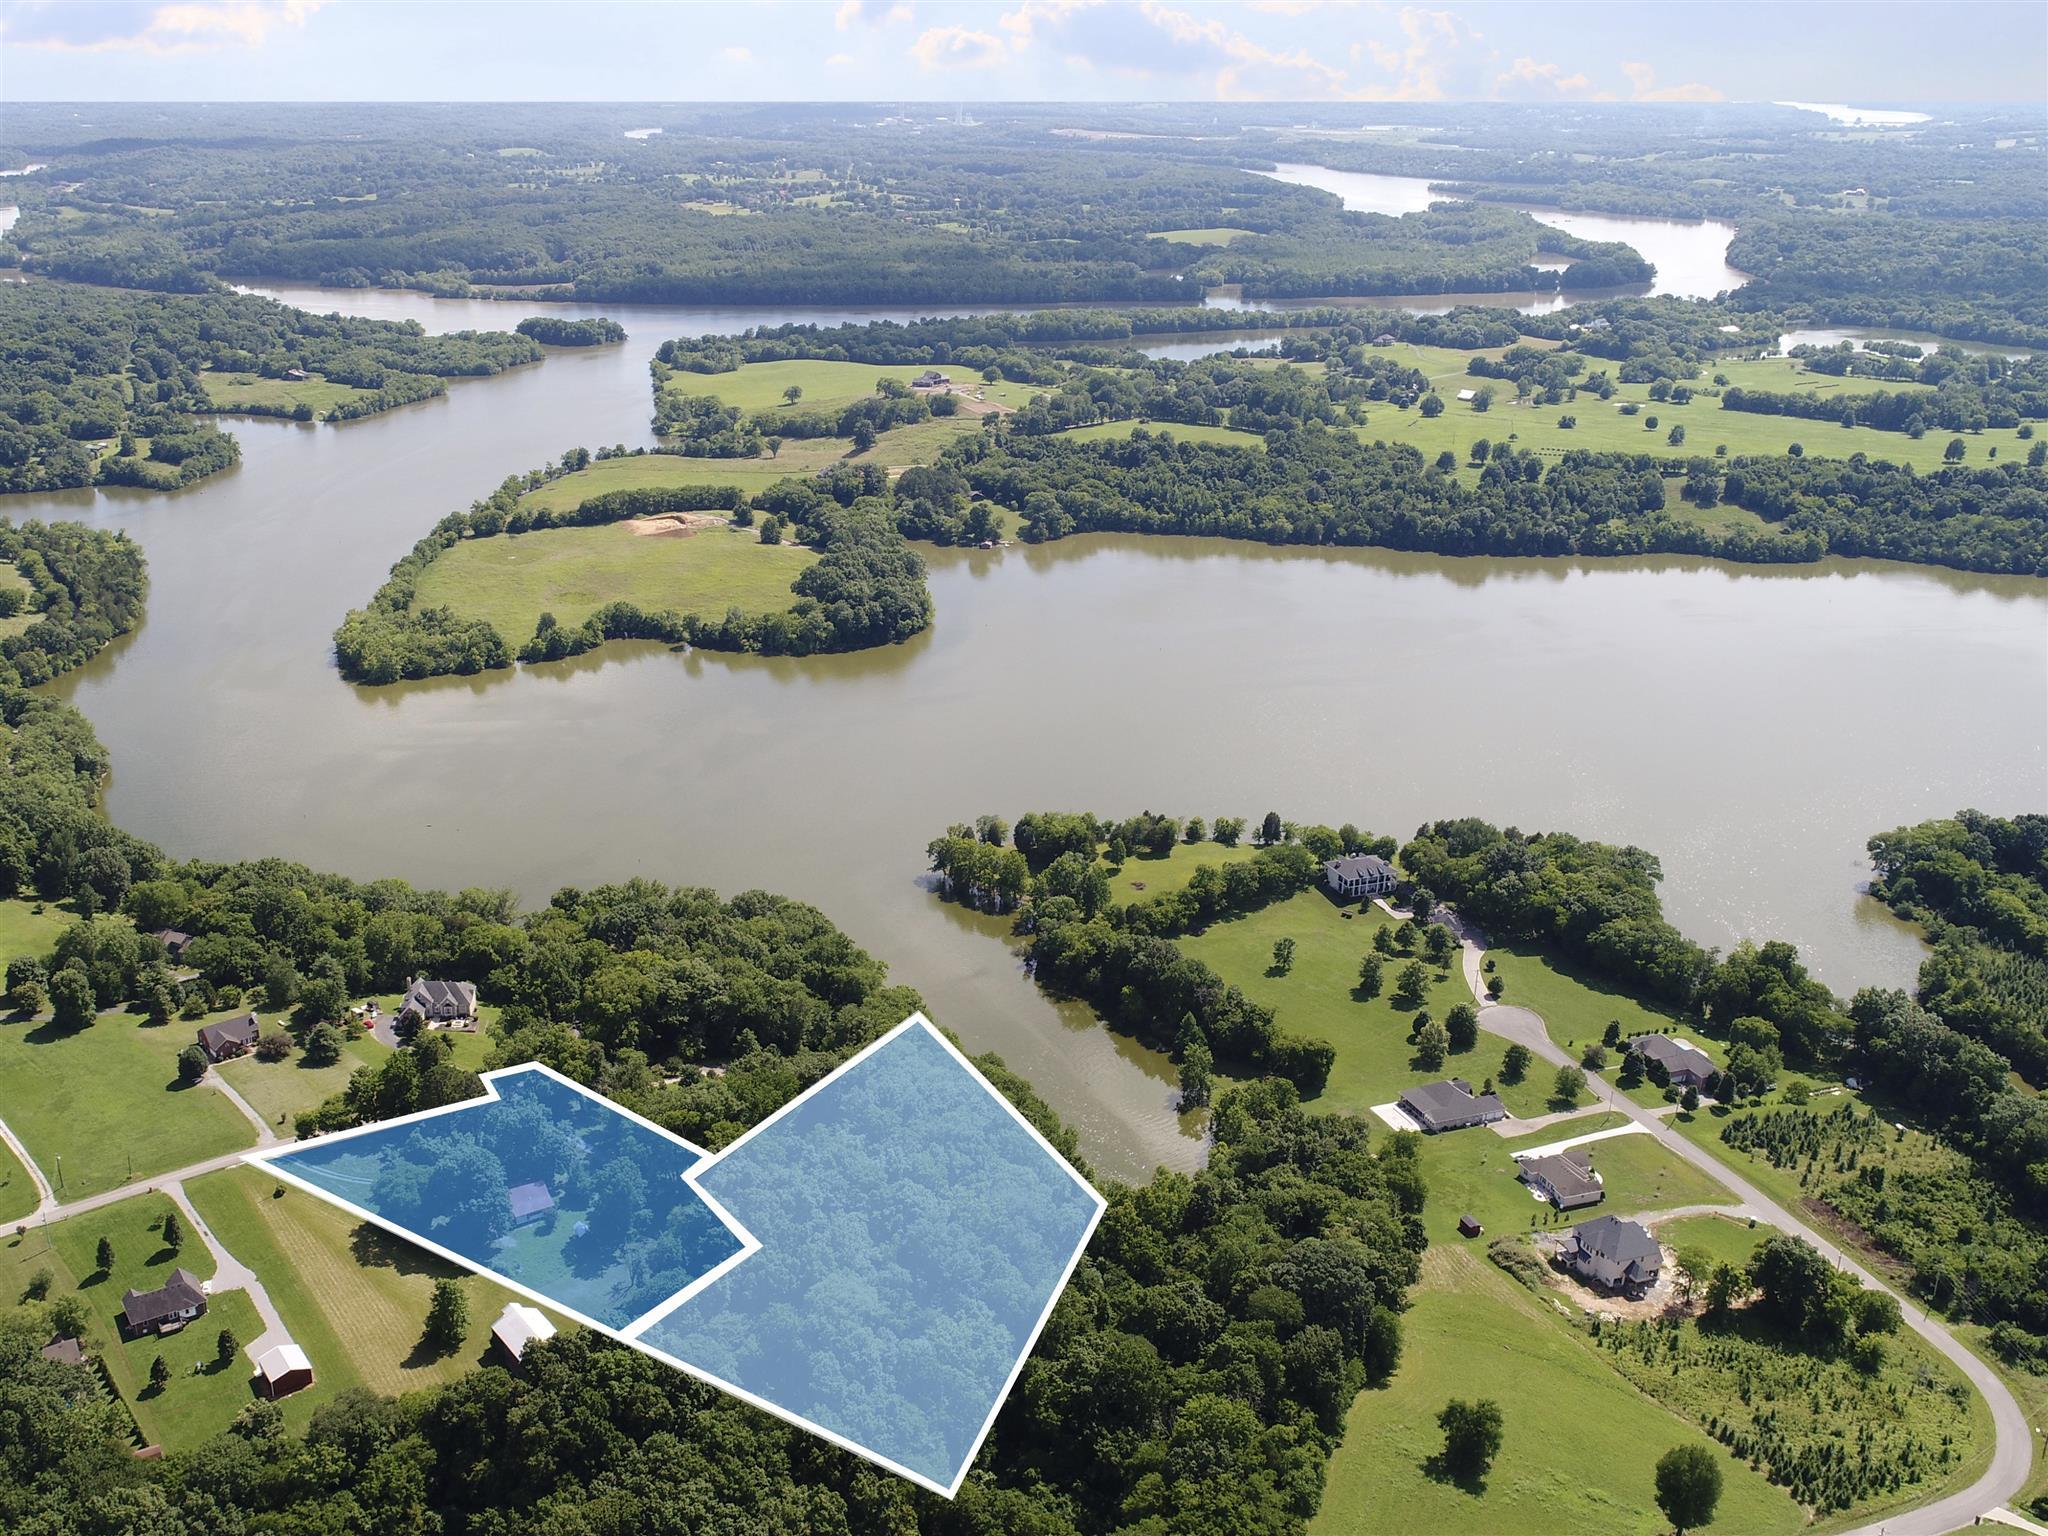 128 E Robertson Rd, Castalian Springs, TN 37031 - Castalian Springs, TN real estate listing